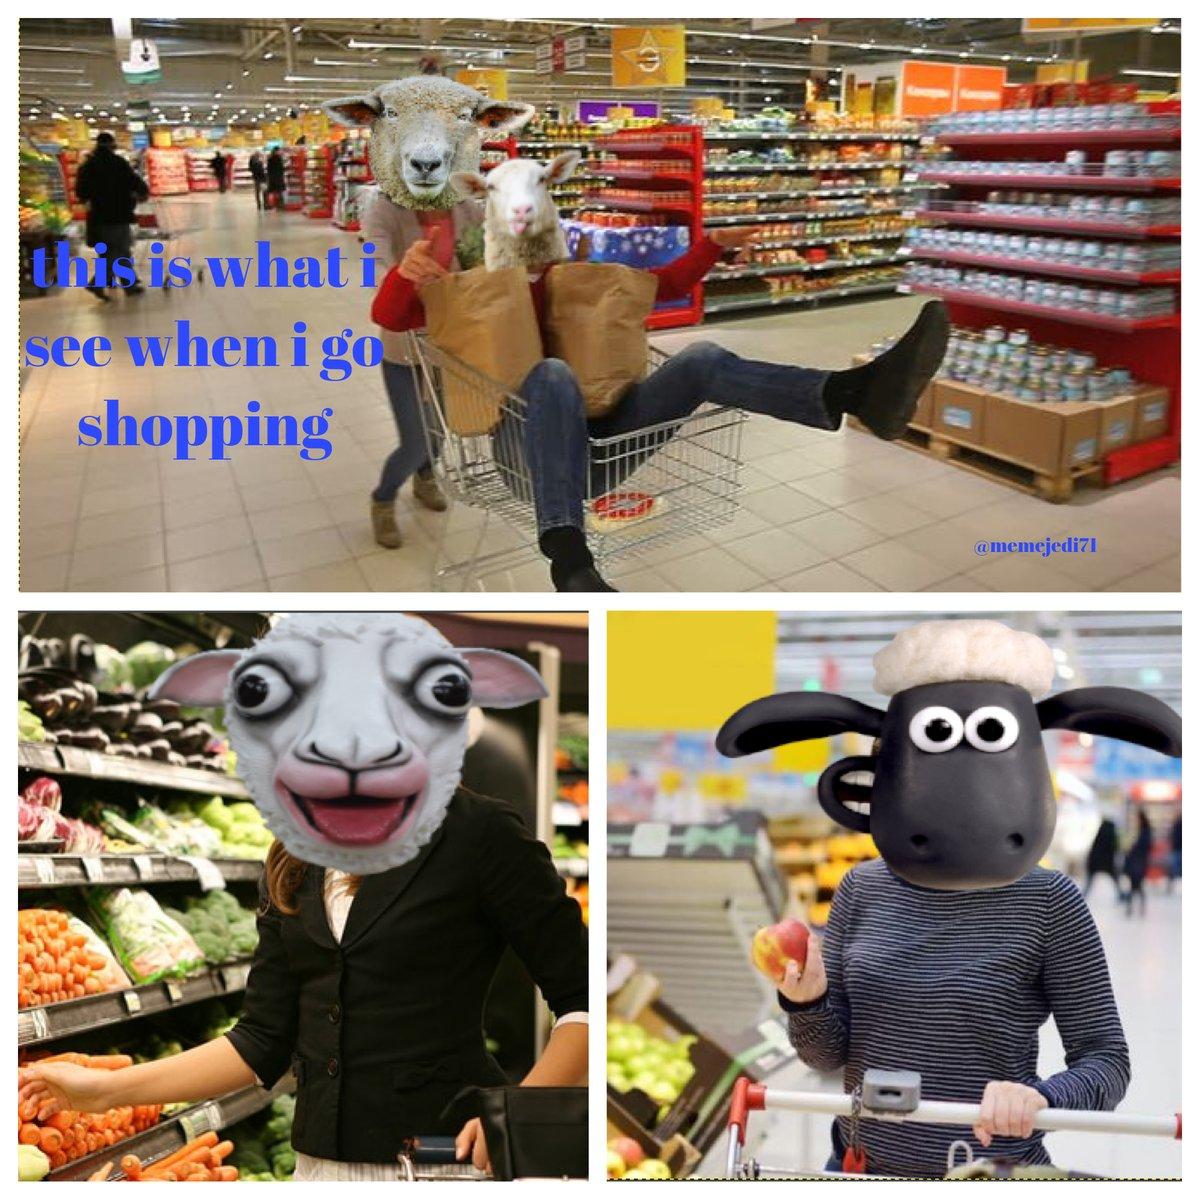 #memes #truth #orwellian #funny #masks #Canada #covid #antimask #Covid1984 #uk #usa #Tyranny #sheeple